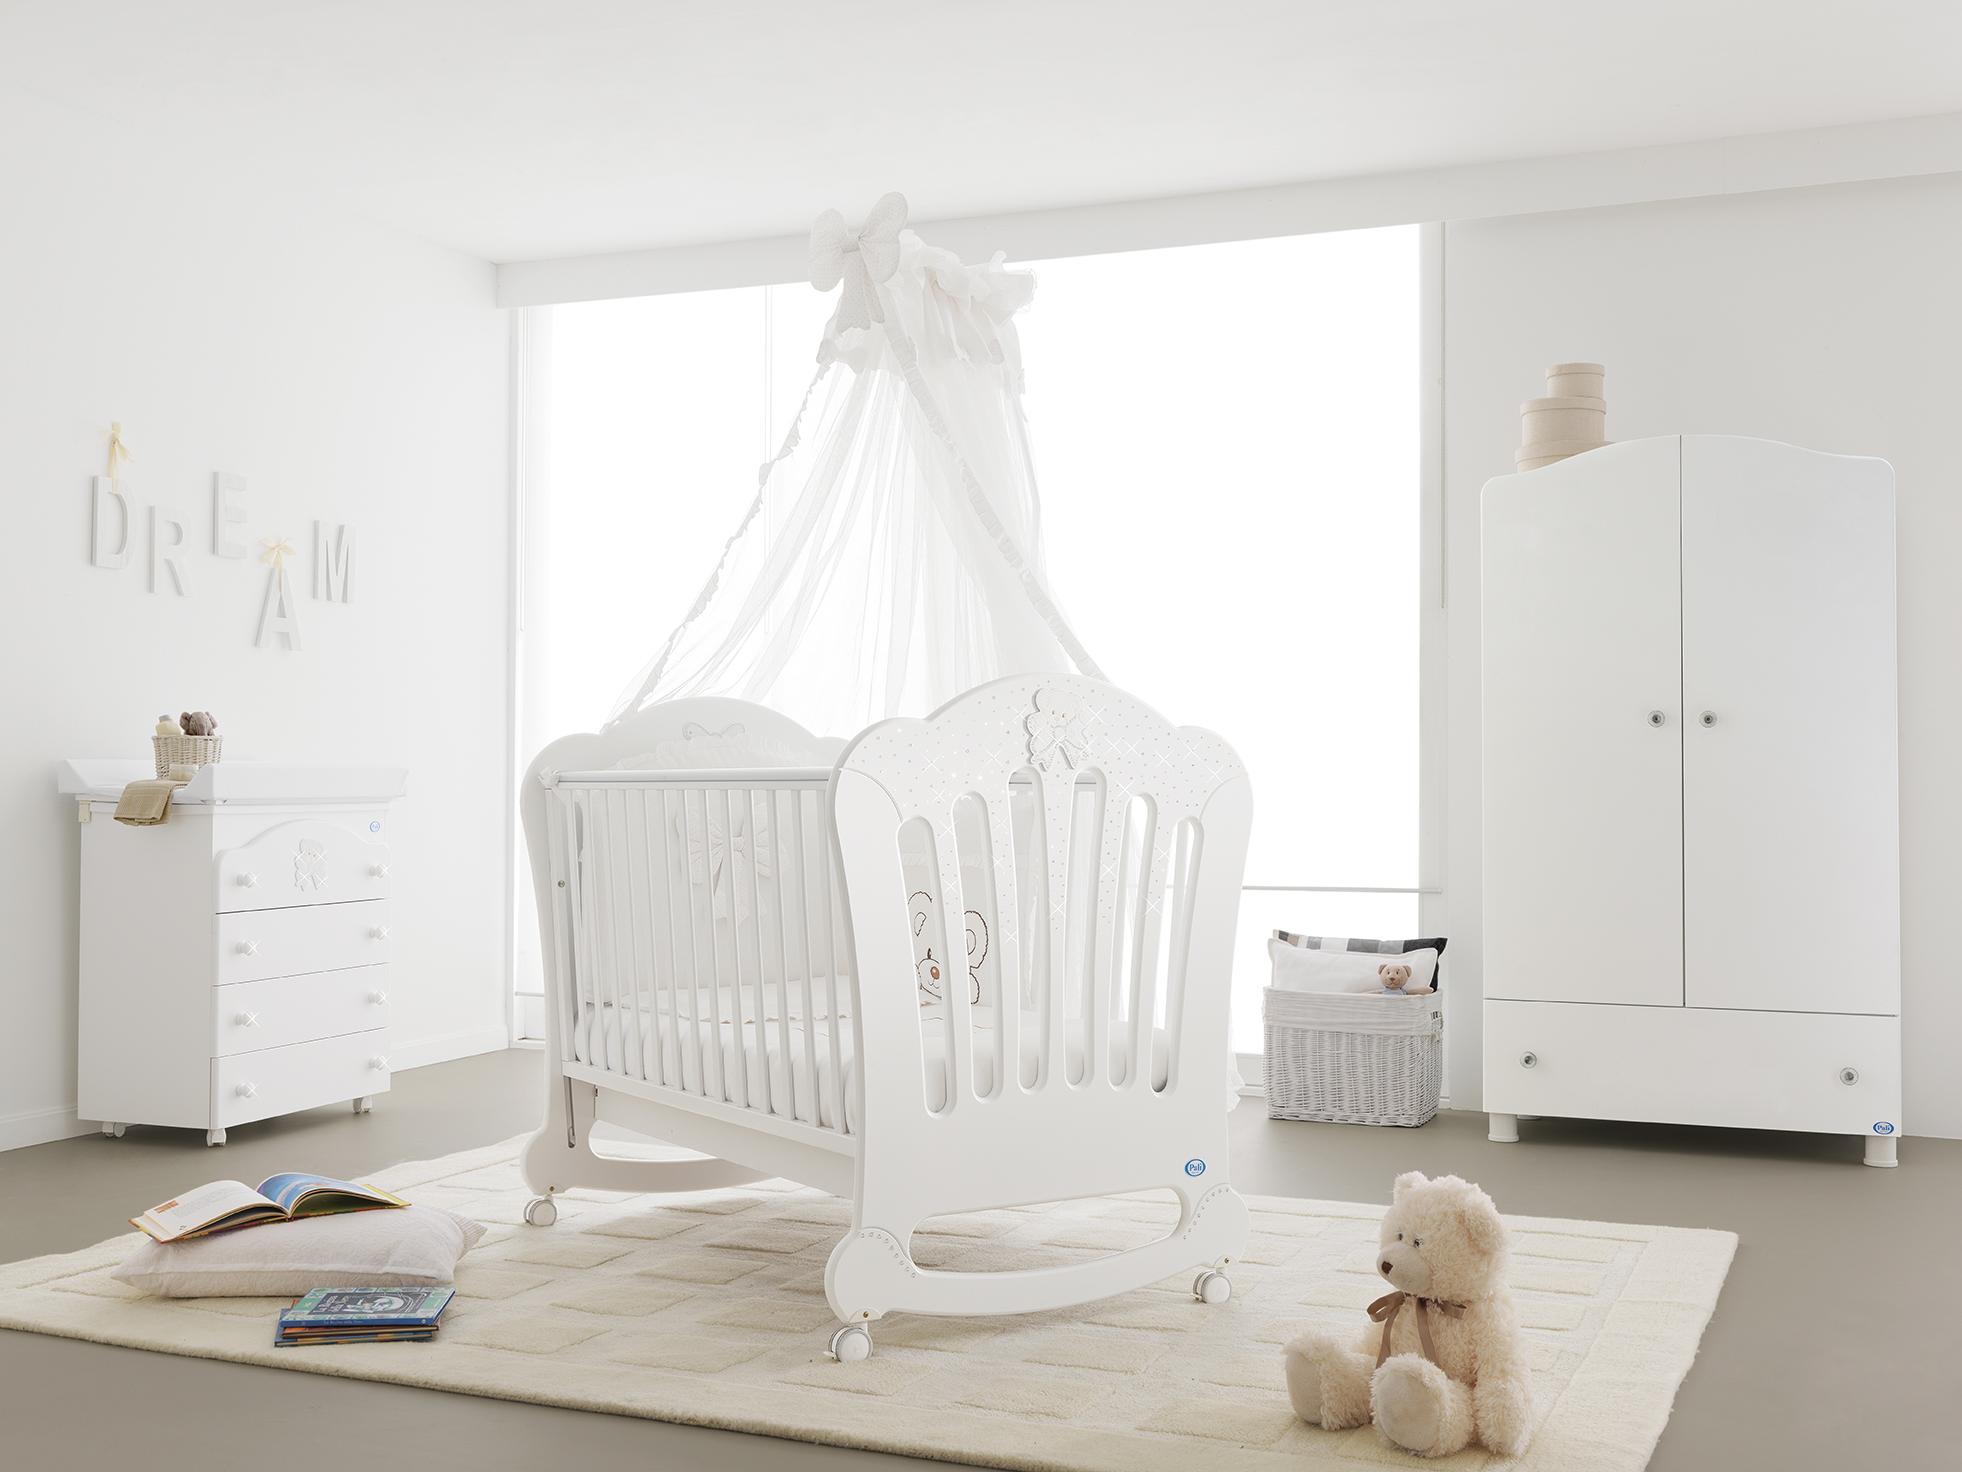 5993 Prestige Principe bianco. 1291 pali prestige principe magnolia d 2b617250cf3